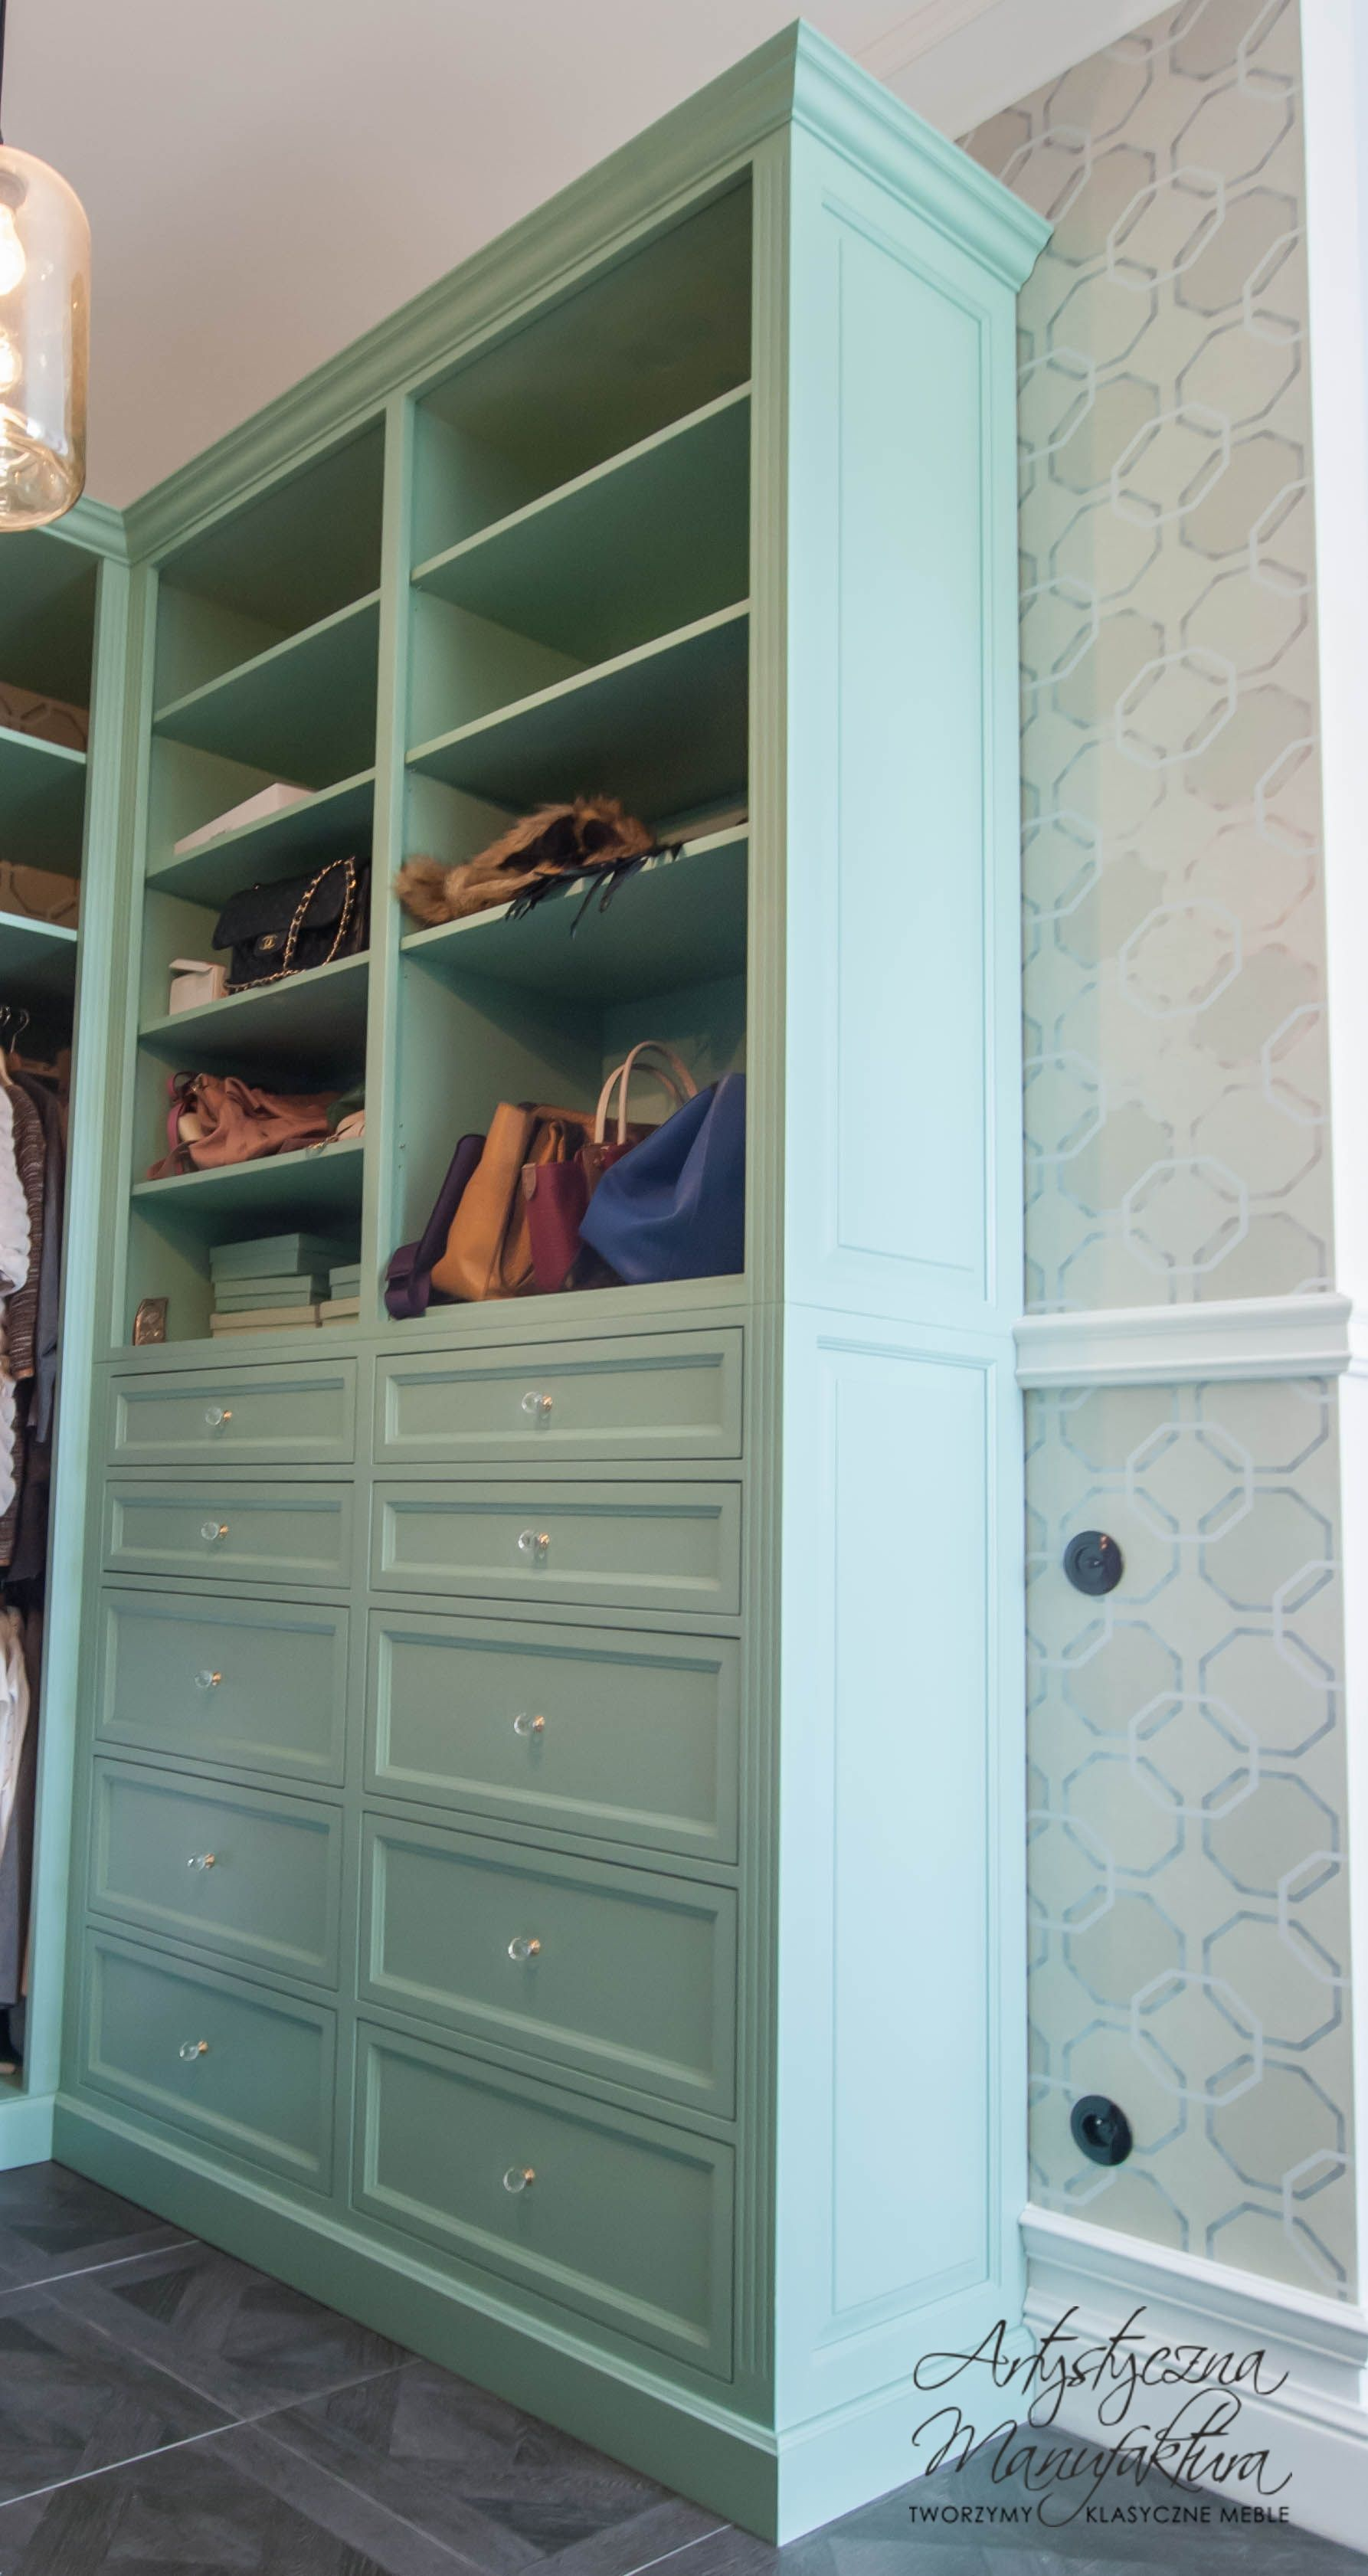 Miętowa Szafa W Garderobie, Mint Closet, Wood Classic Furniture, Wardrobe  With Drawers,